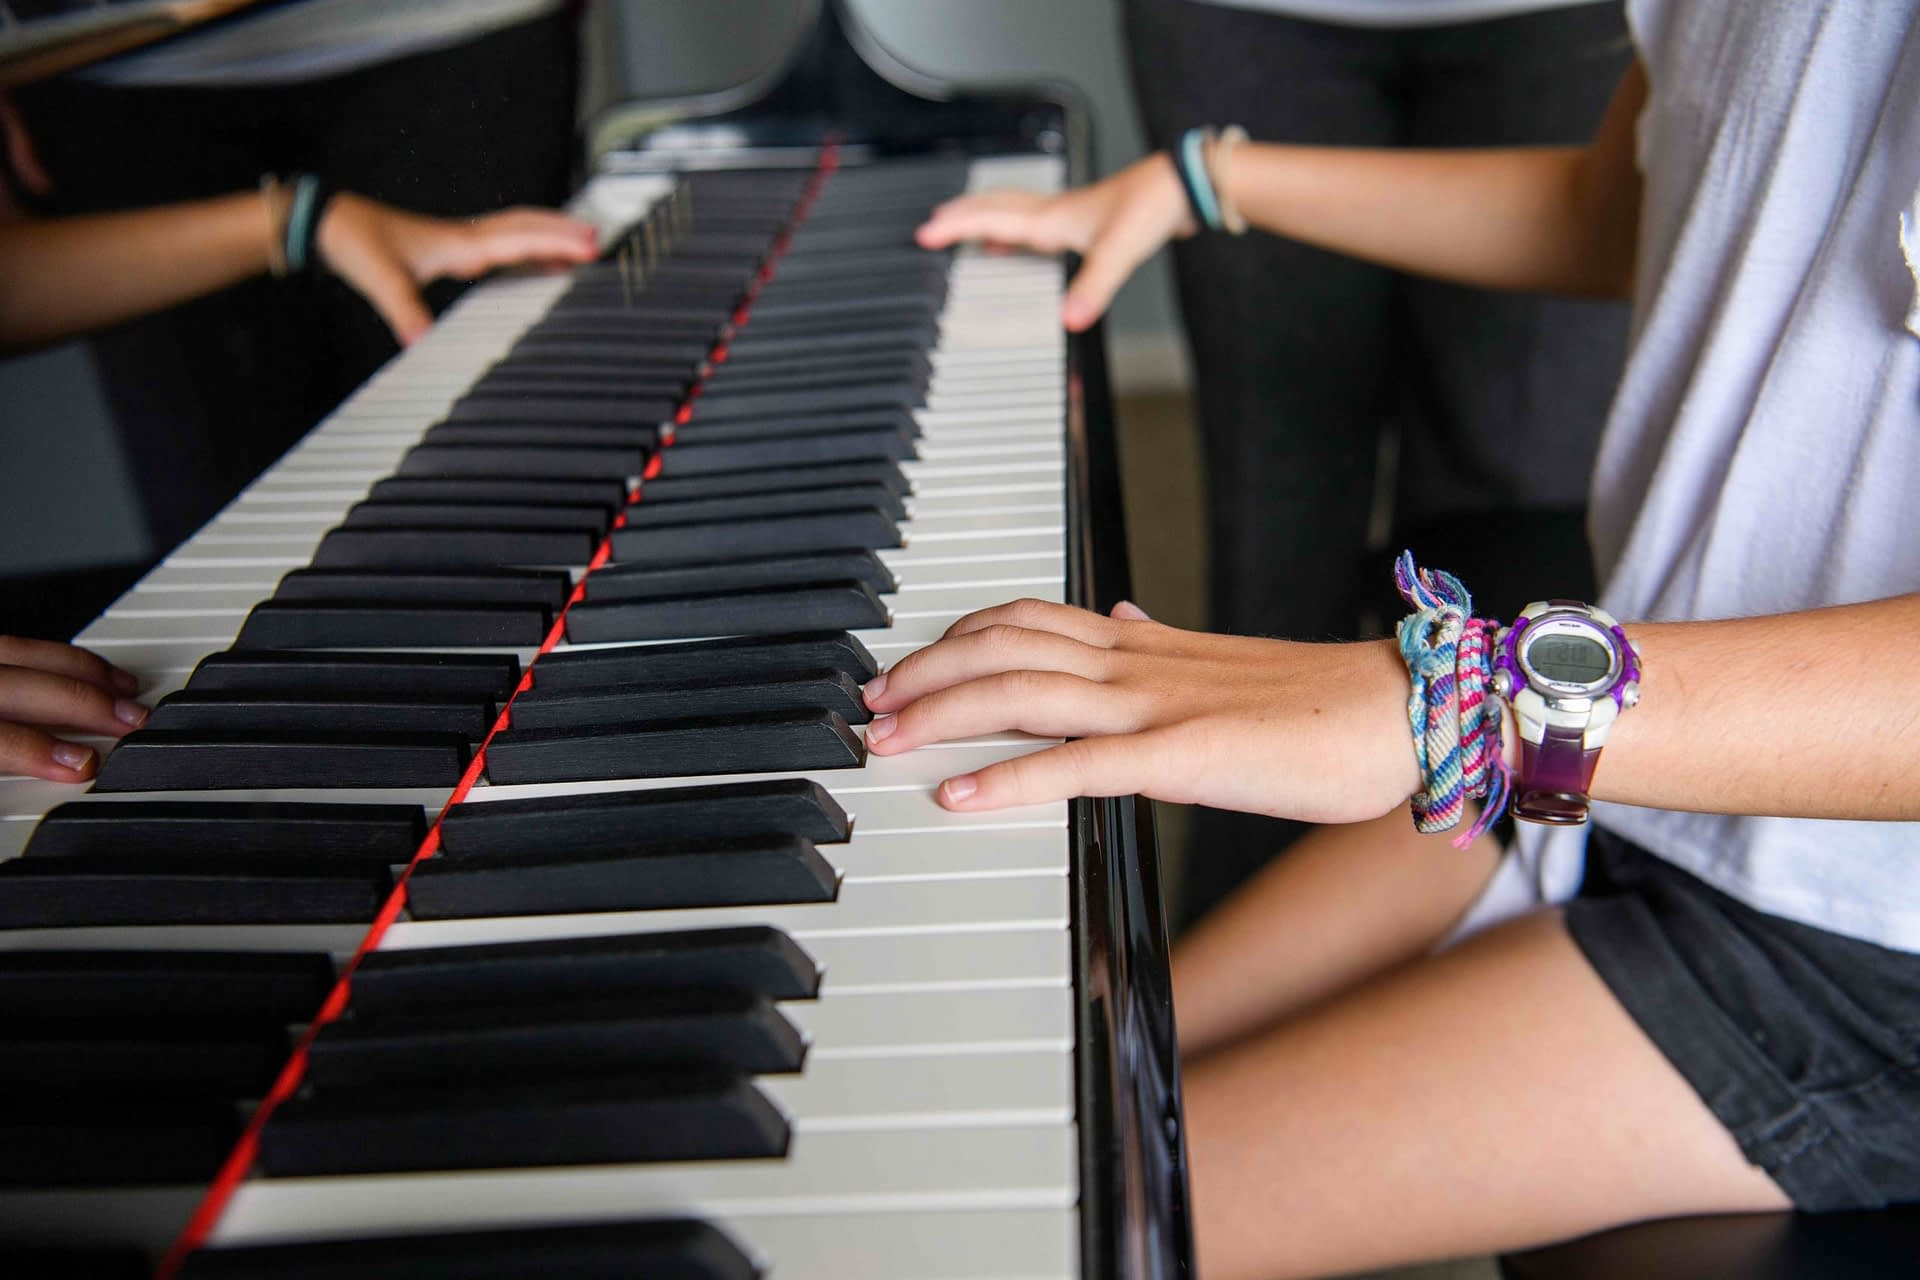 Recreational piano student hands